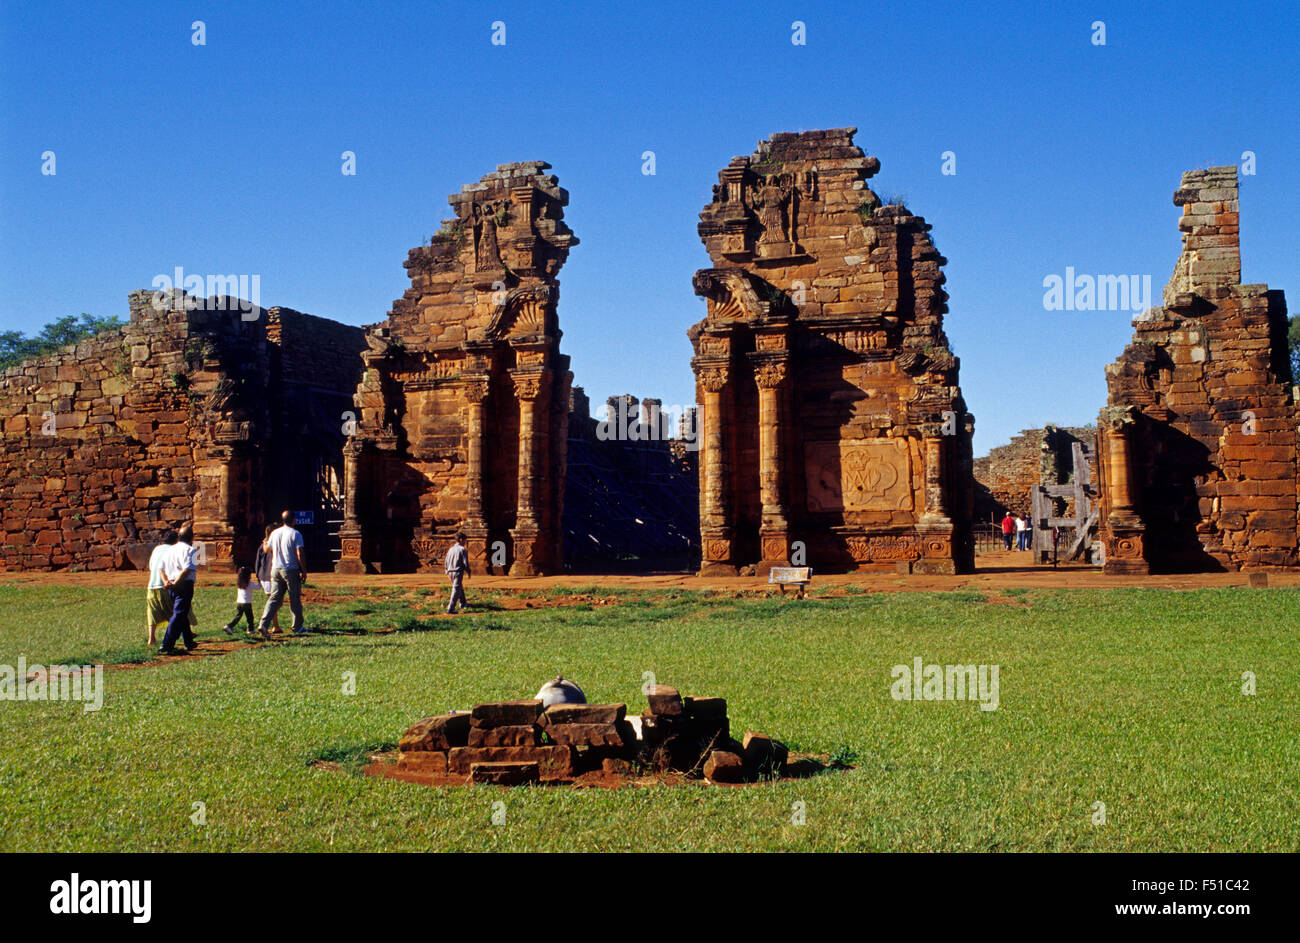 Church gate. Jesuit Mission of San Ignacio Mini ruins. Misiones province. Argentina. - Stock Image